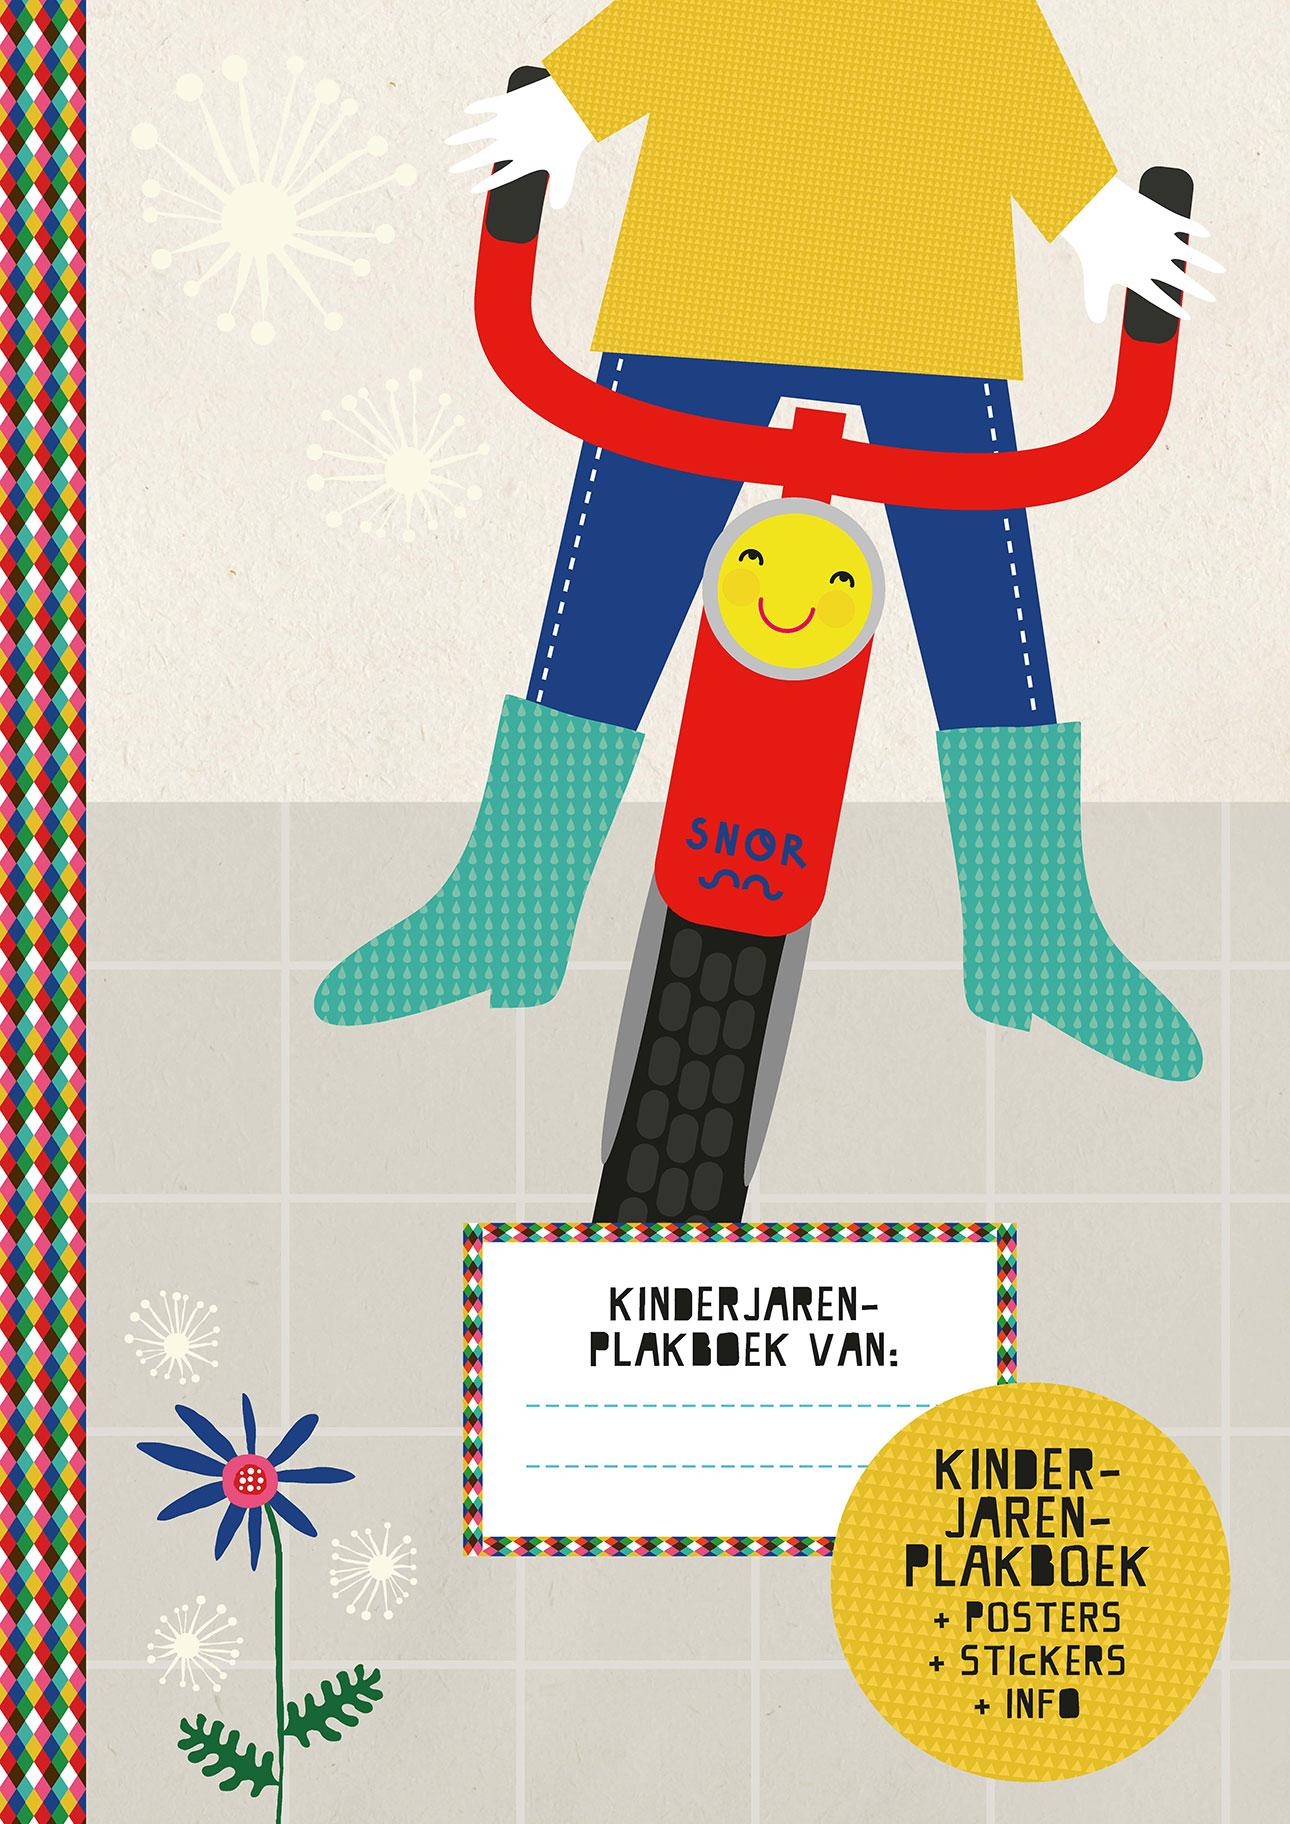 Moederdag wishlist van Marike - kinderjarenplakboek